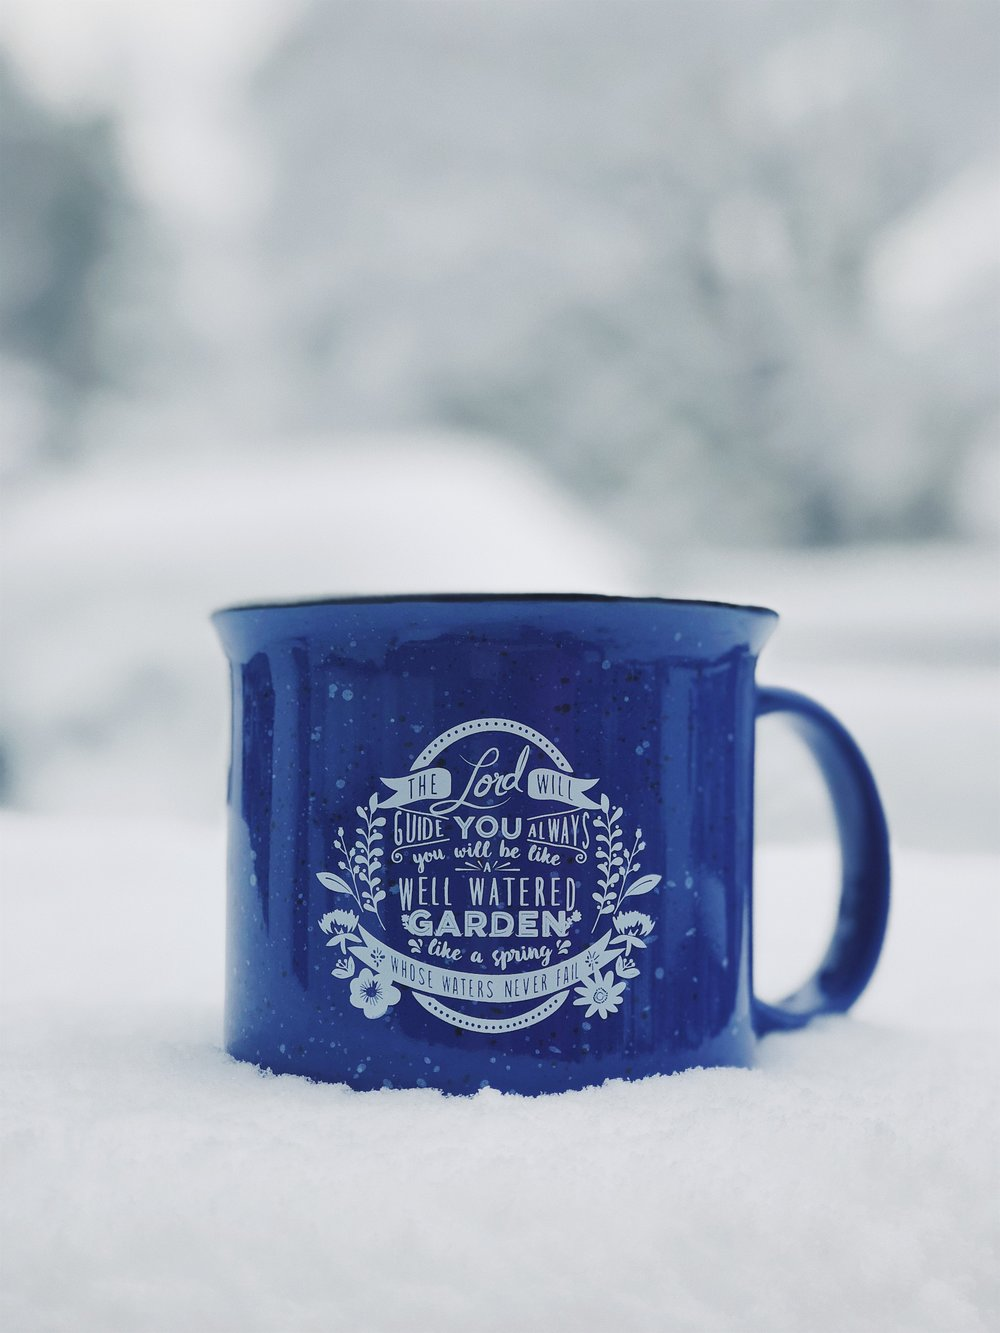 Find the Isaiah 58 mug here.